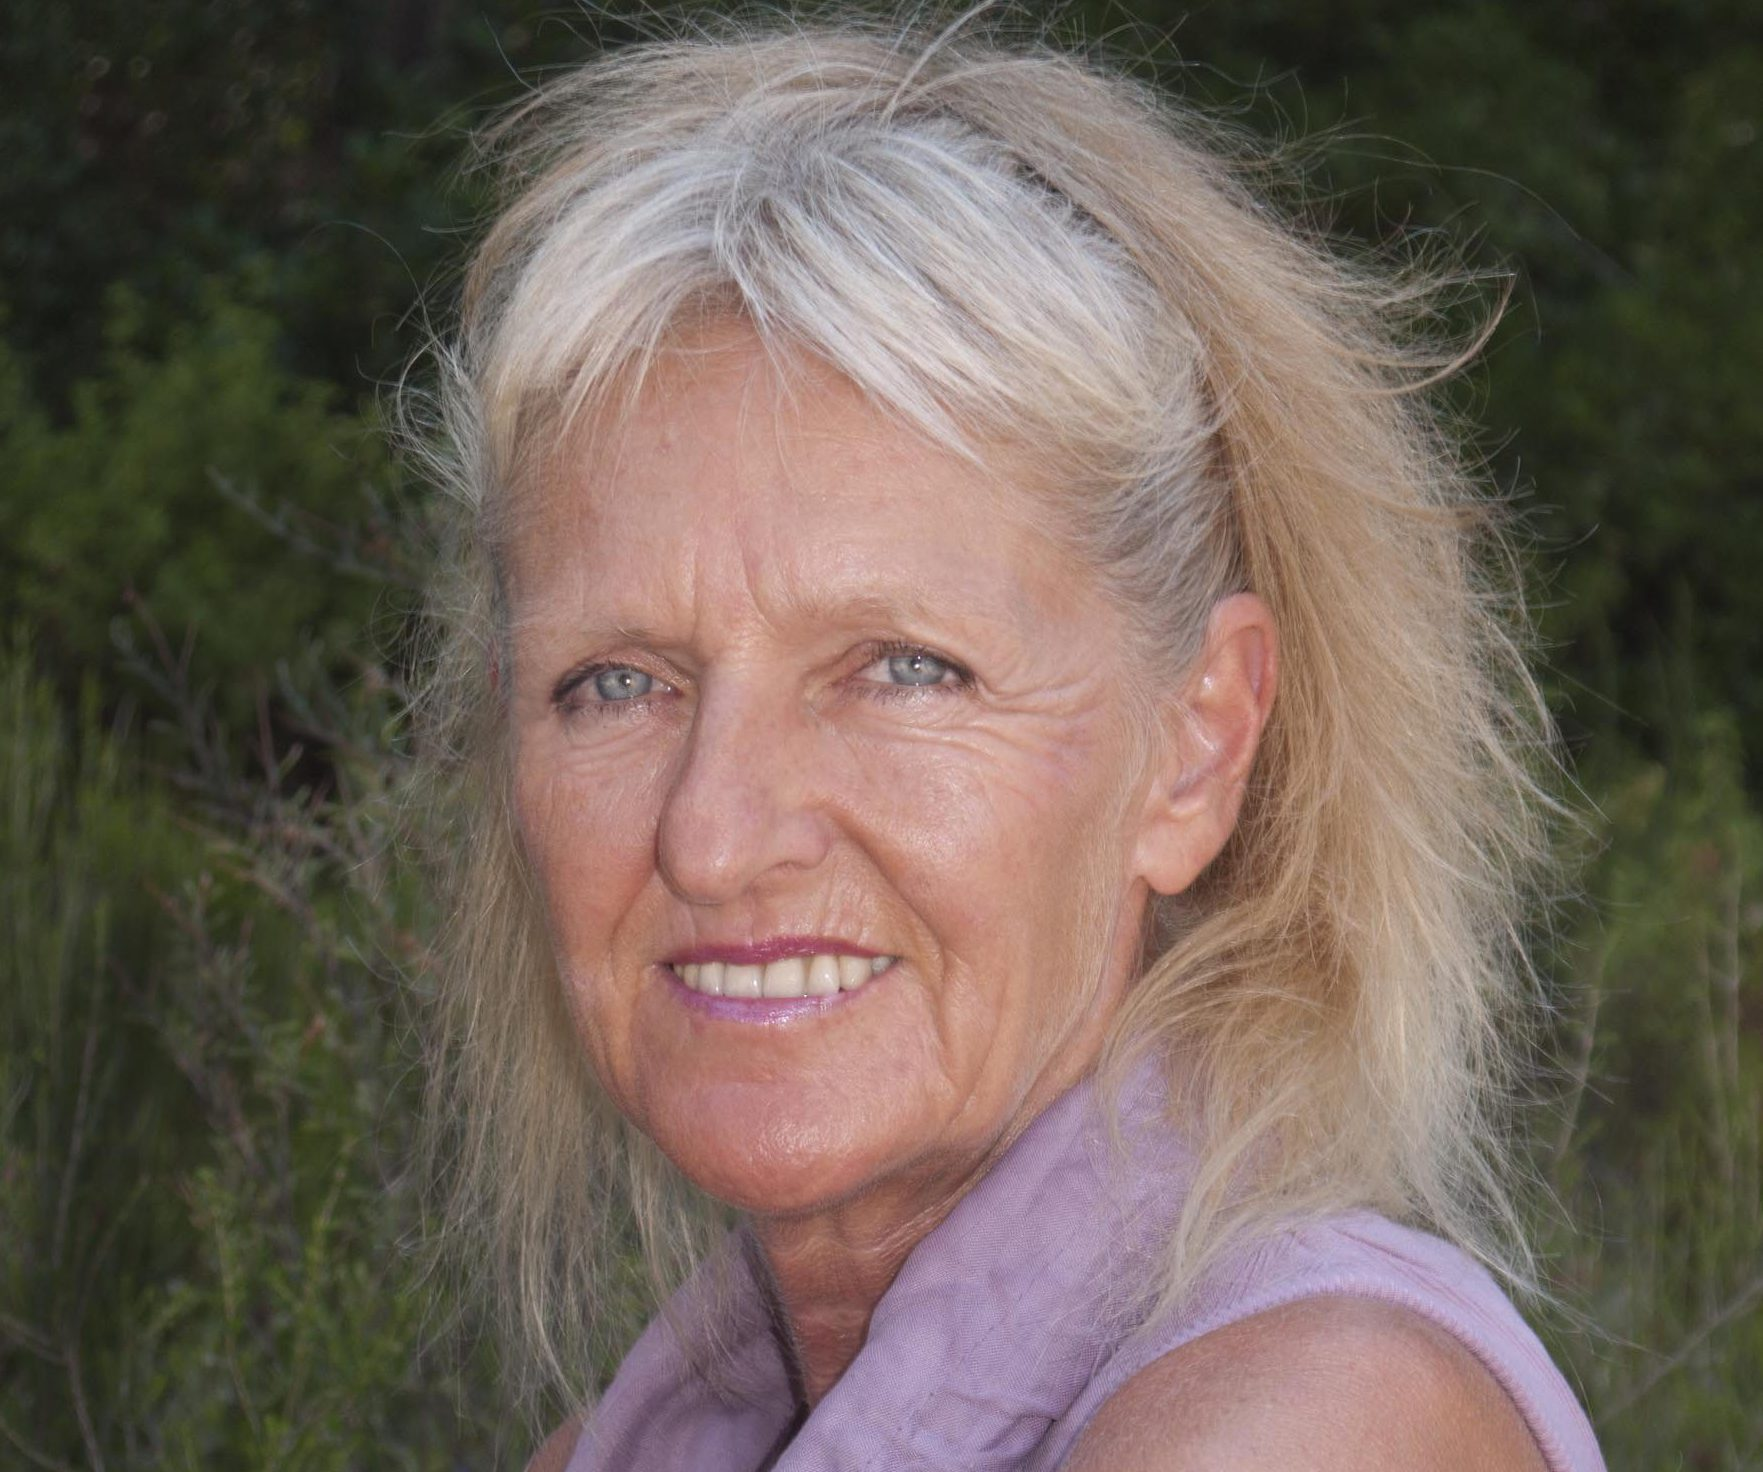 Kurz Vorgestellt: Uschi Ostermeier-Sitkowski, Yogalehrerin